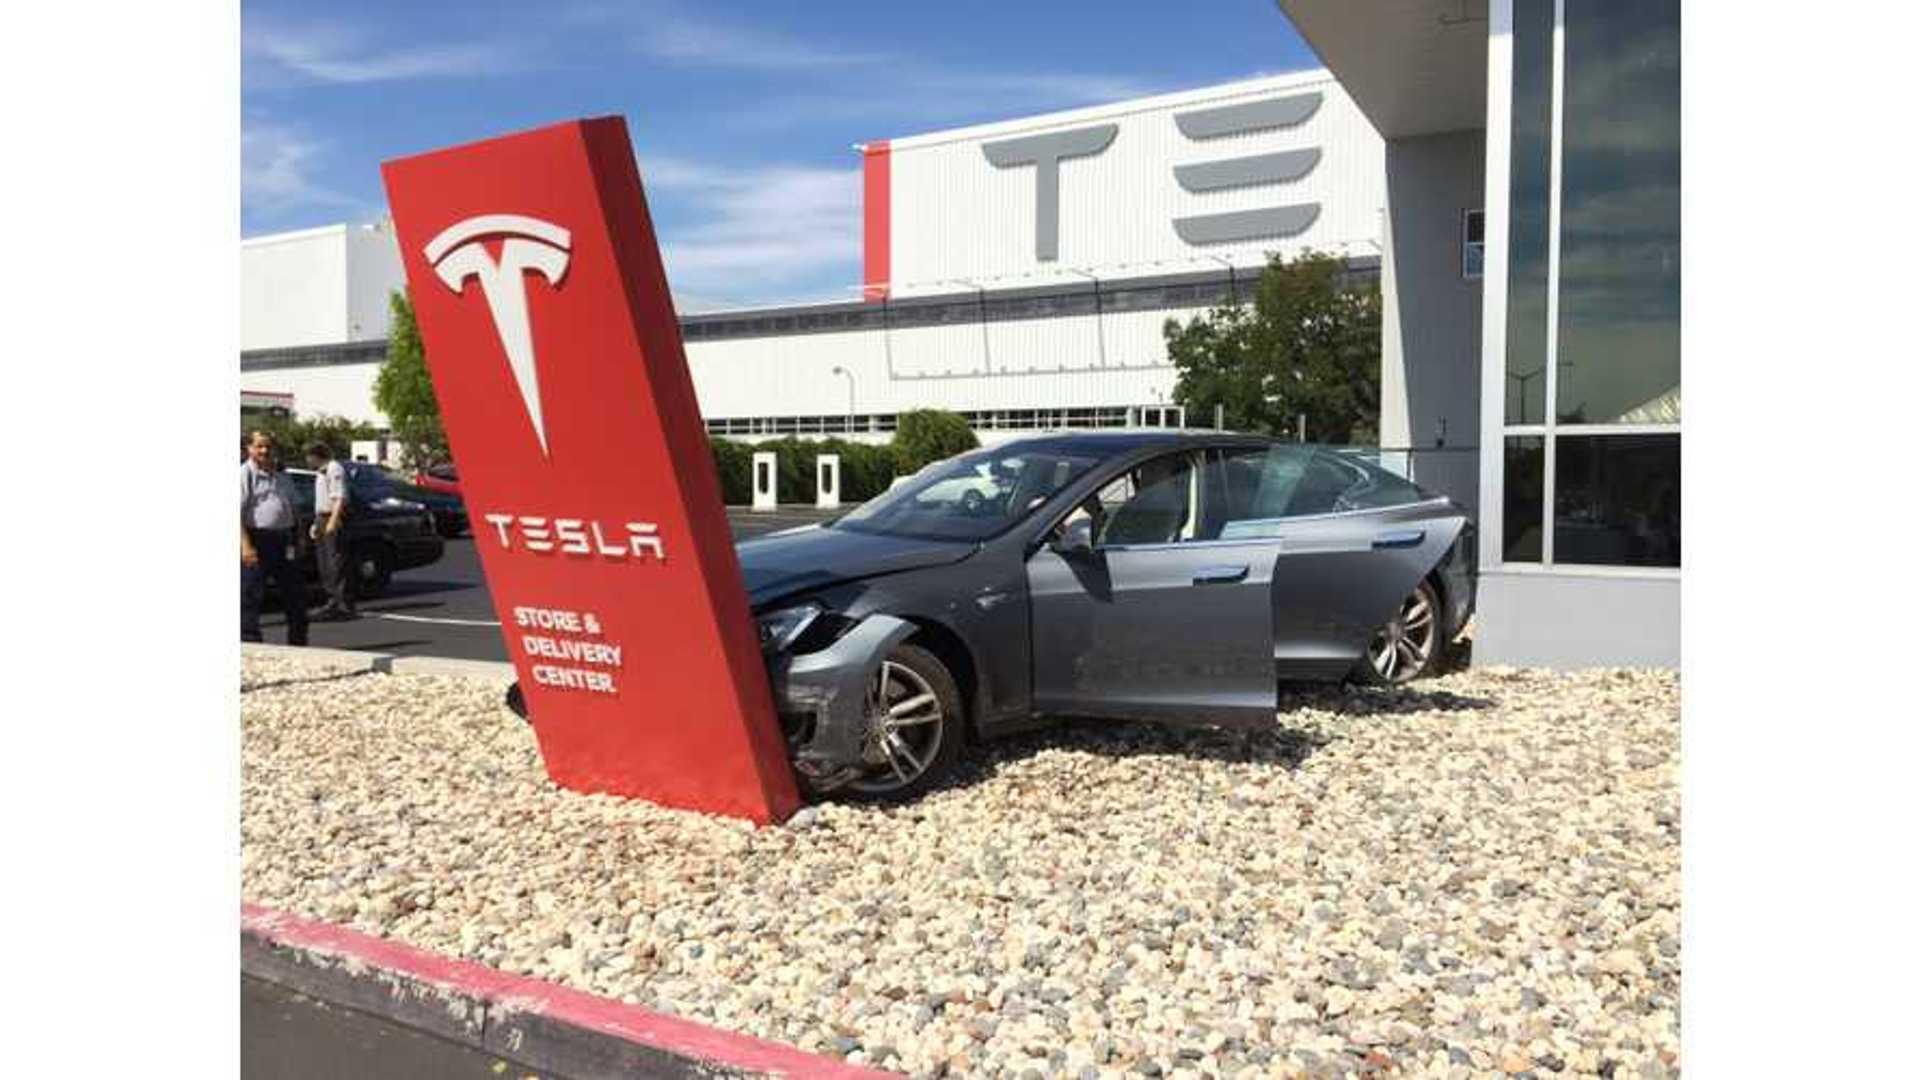 Tesla Cars In Junkyards Still Retain Personal Data